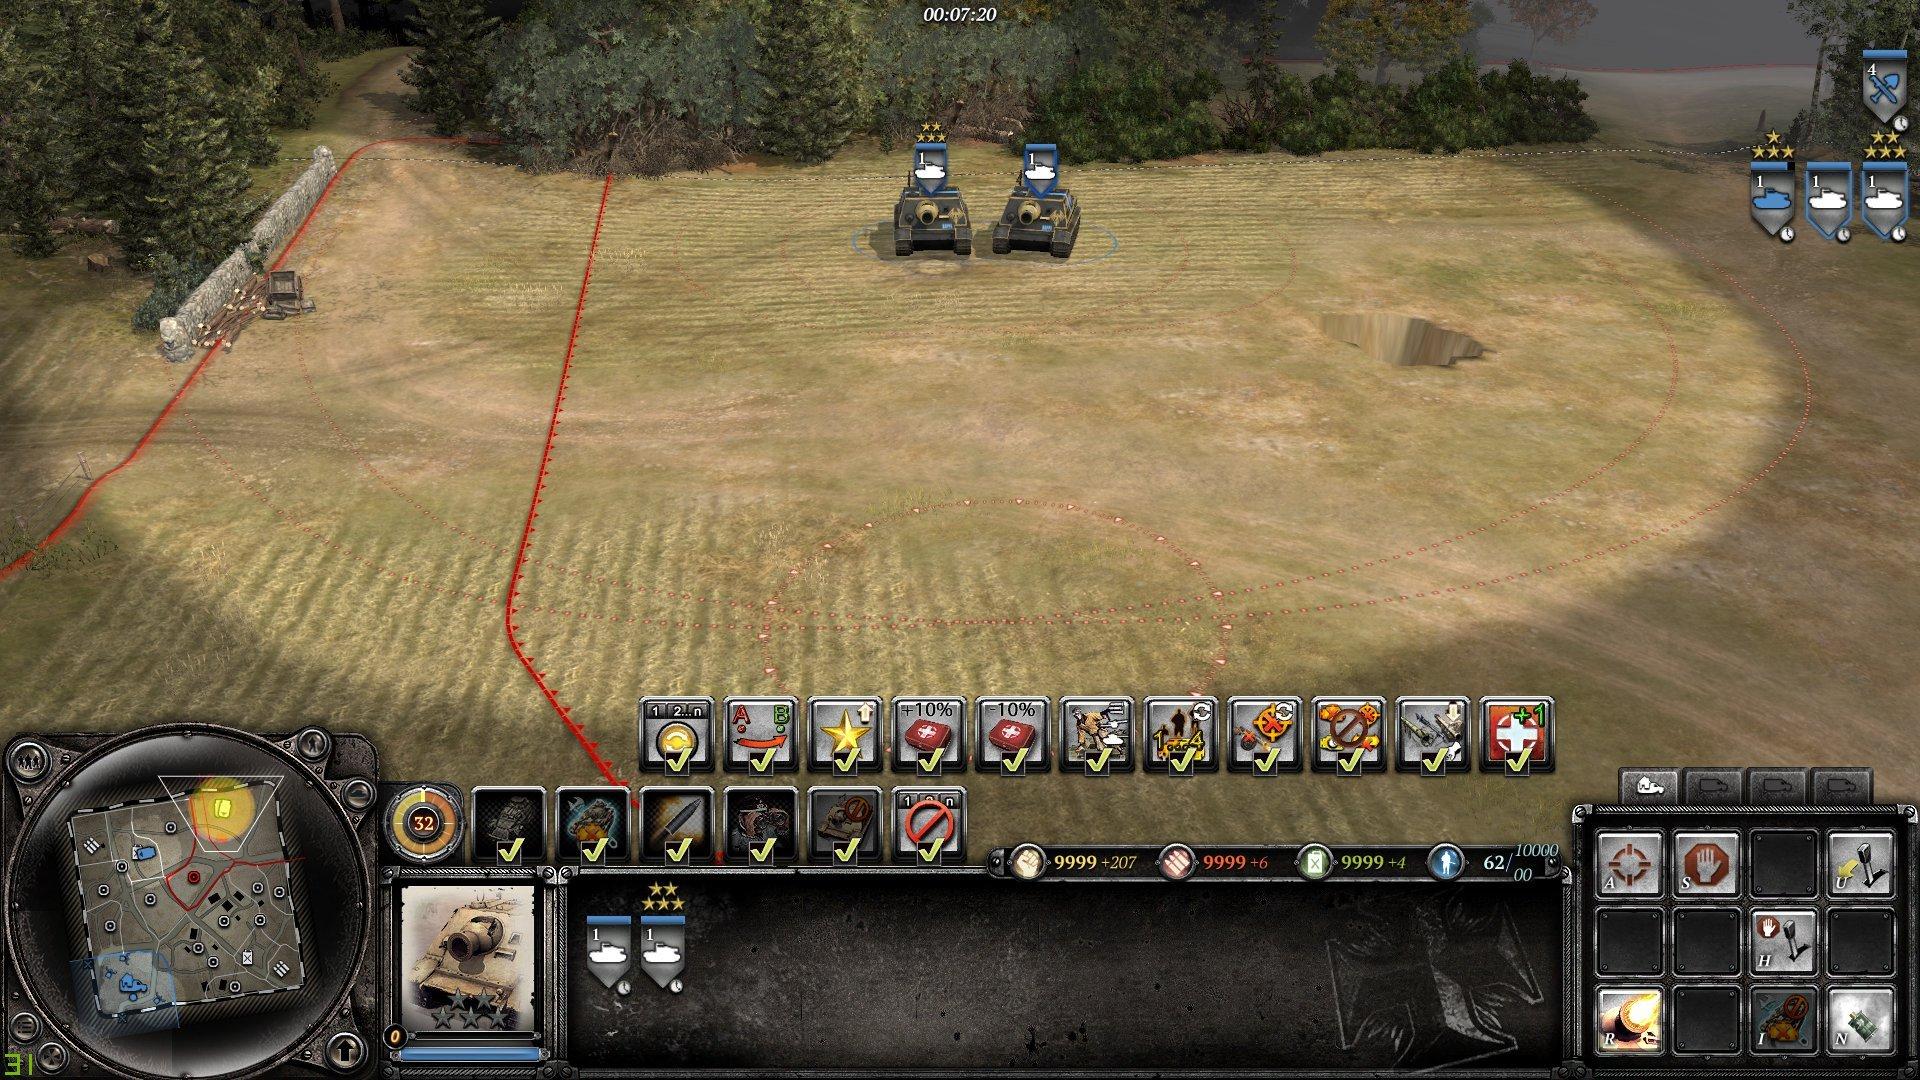 OKW Sturmtigers Vet 4 bonus isn't working as described — Company of